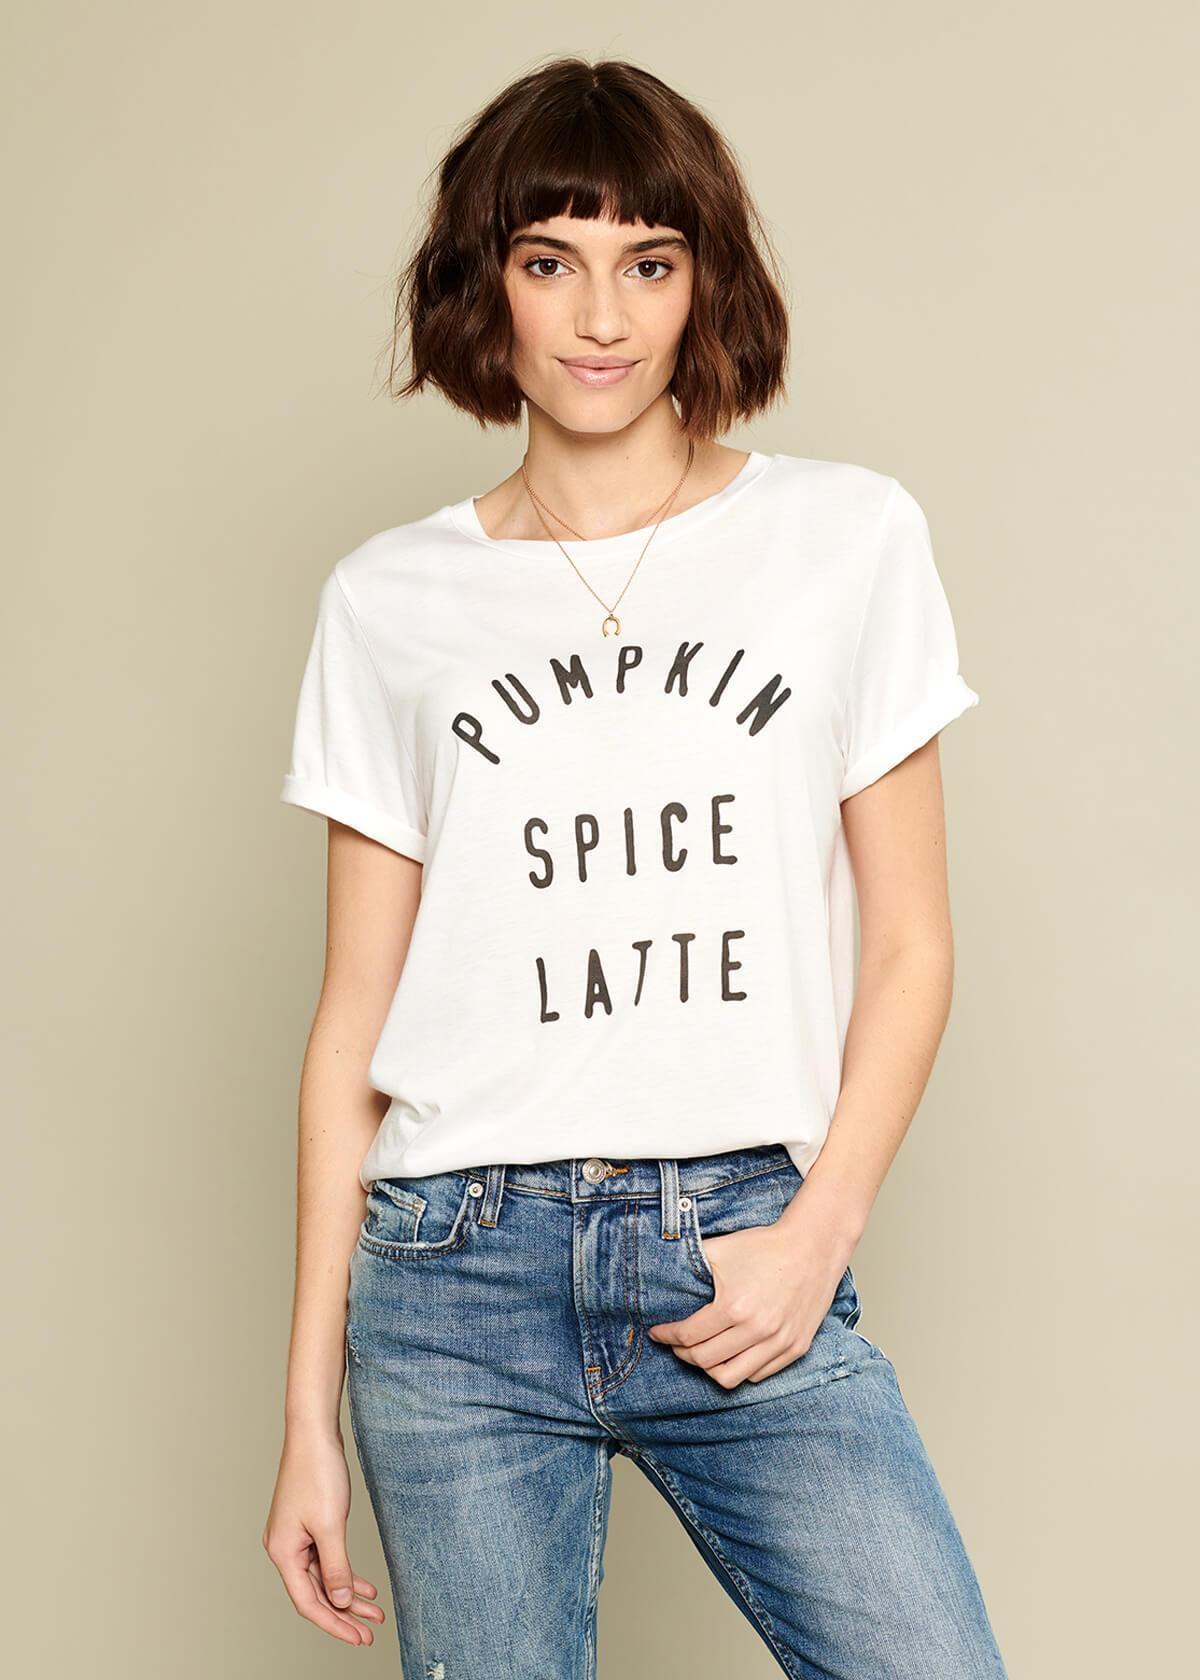 SOUTH PARADE LOLA - Pumpkin Spice